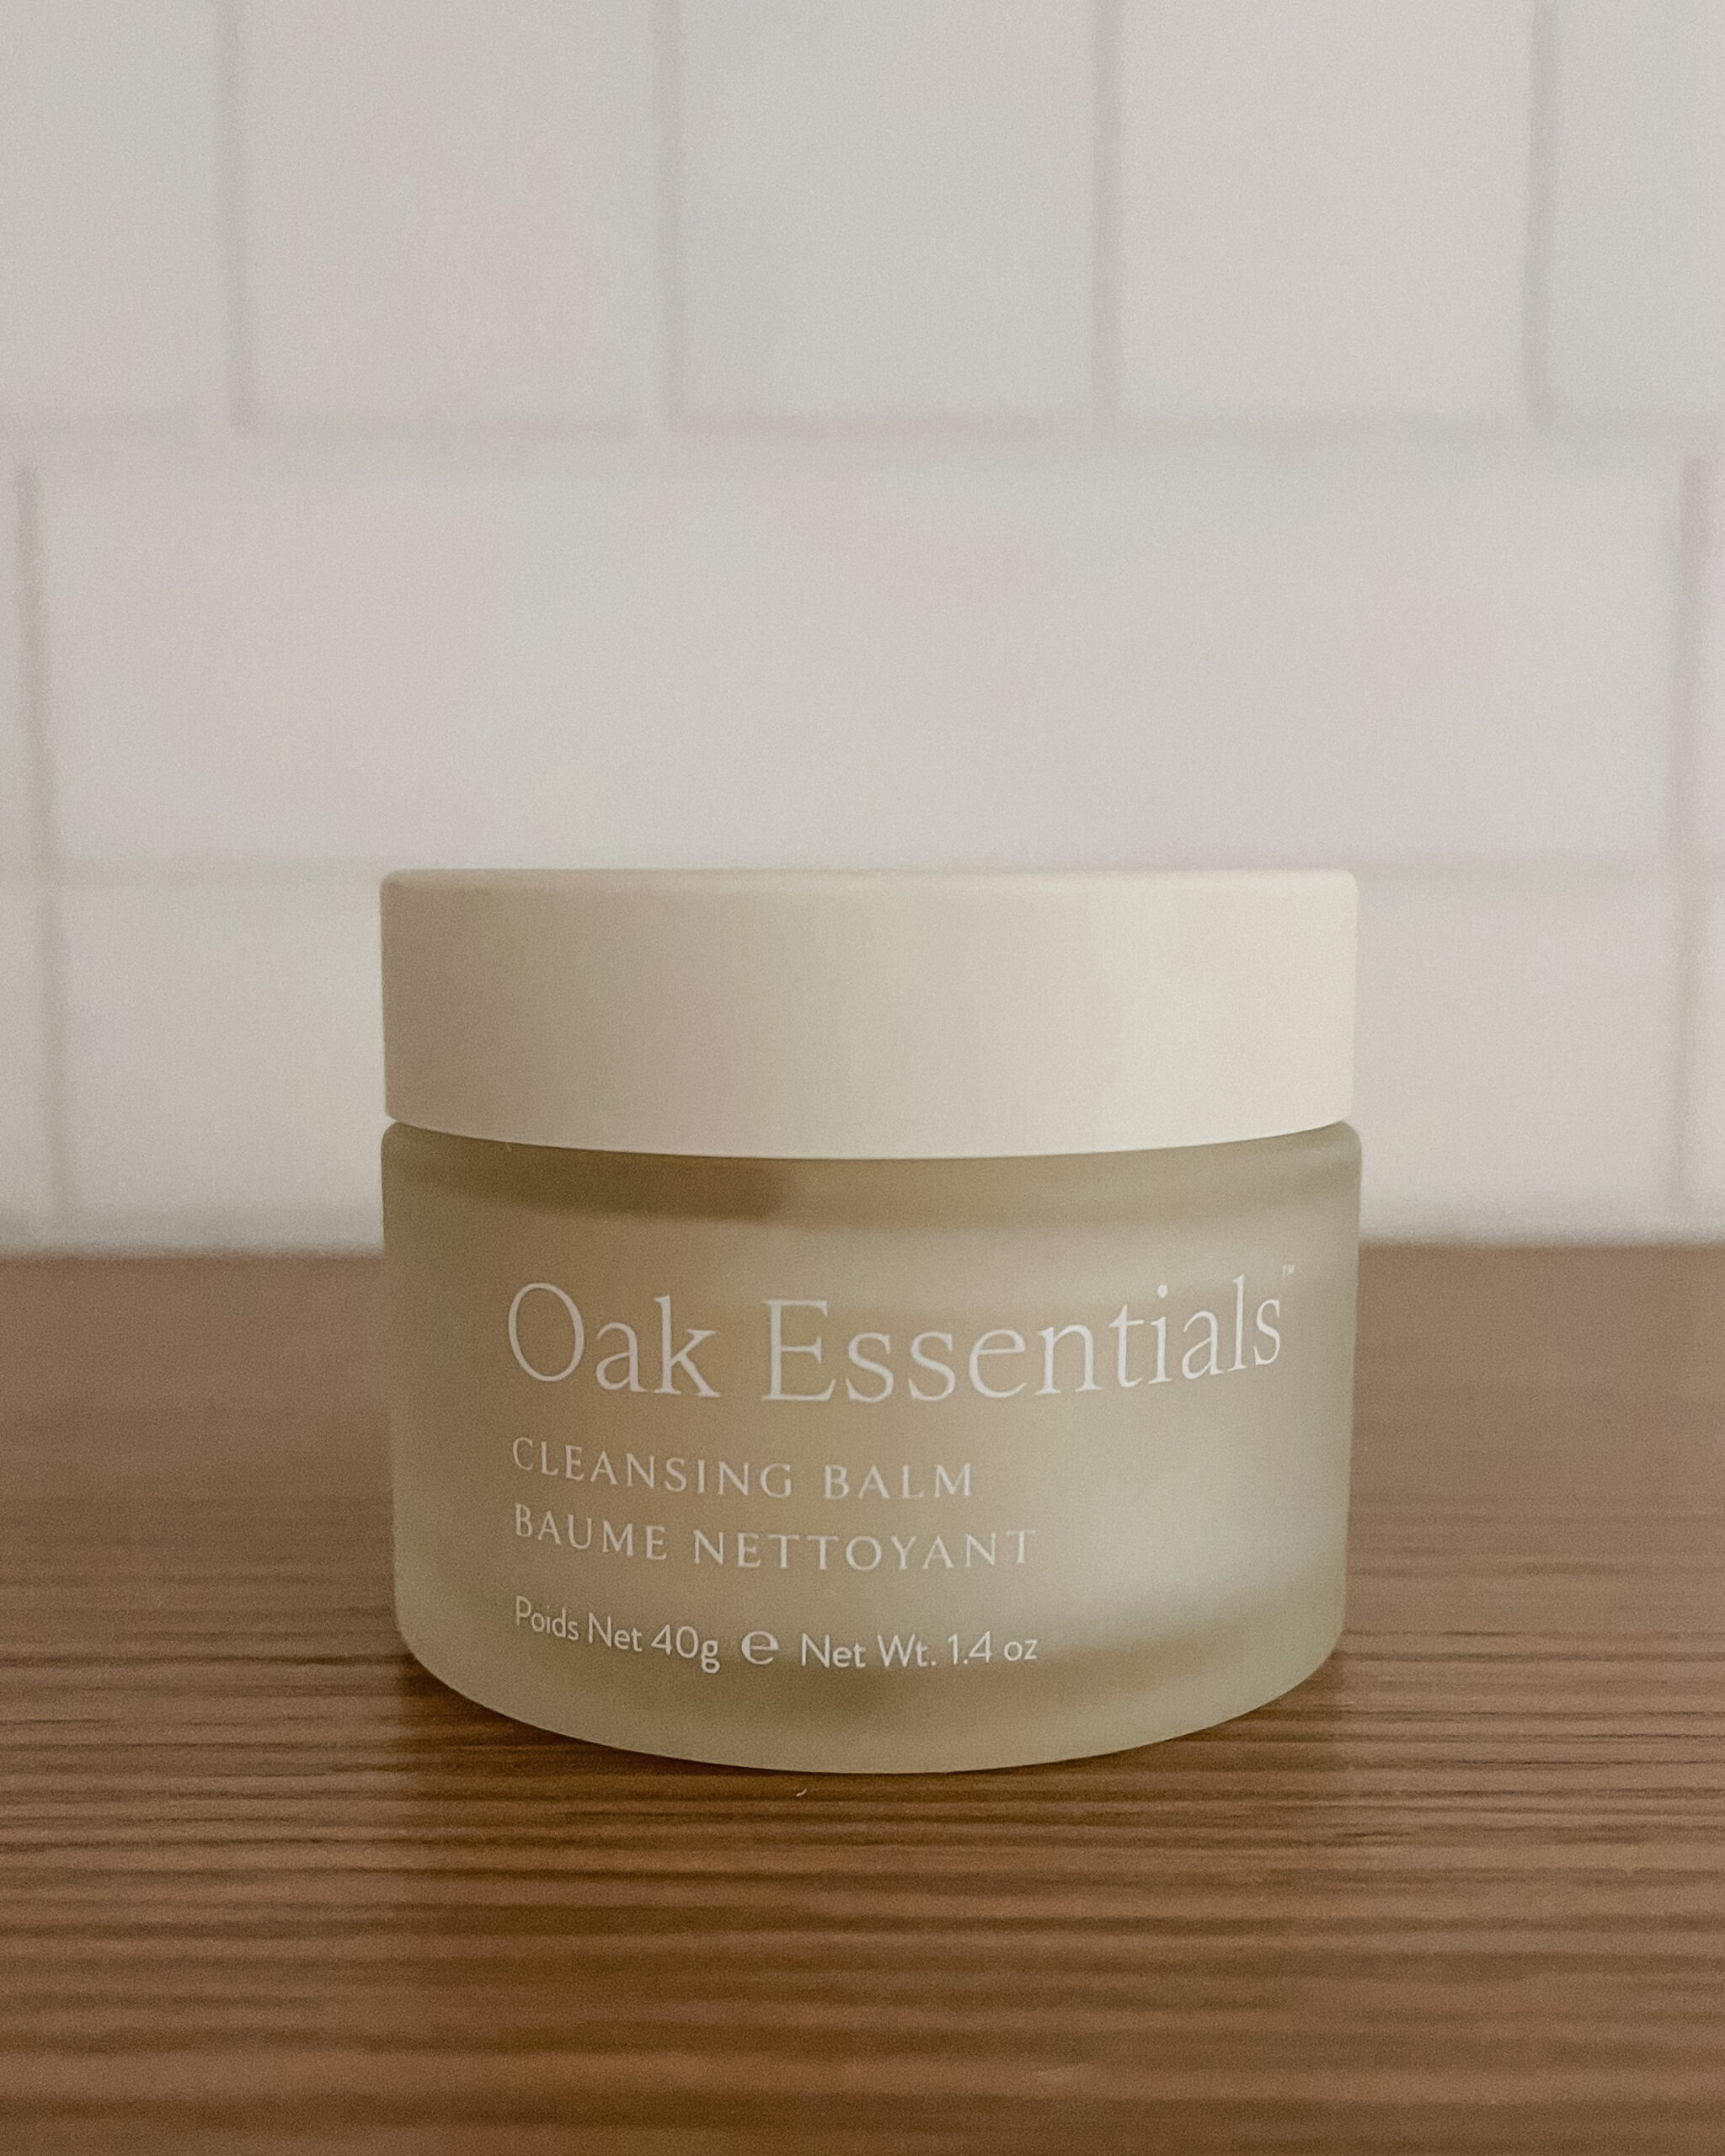 Jenni Kayne Oak Essentials Cleansing Balm